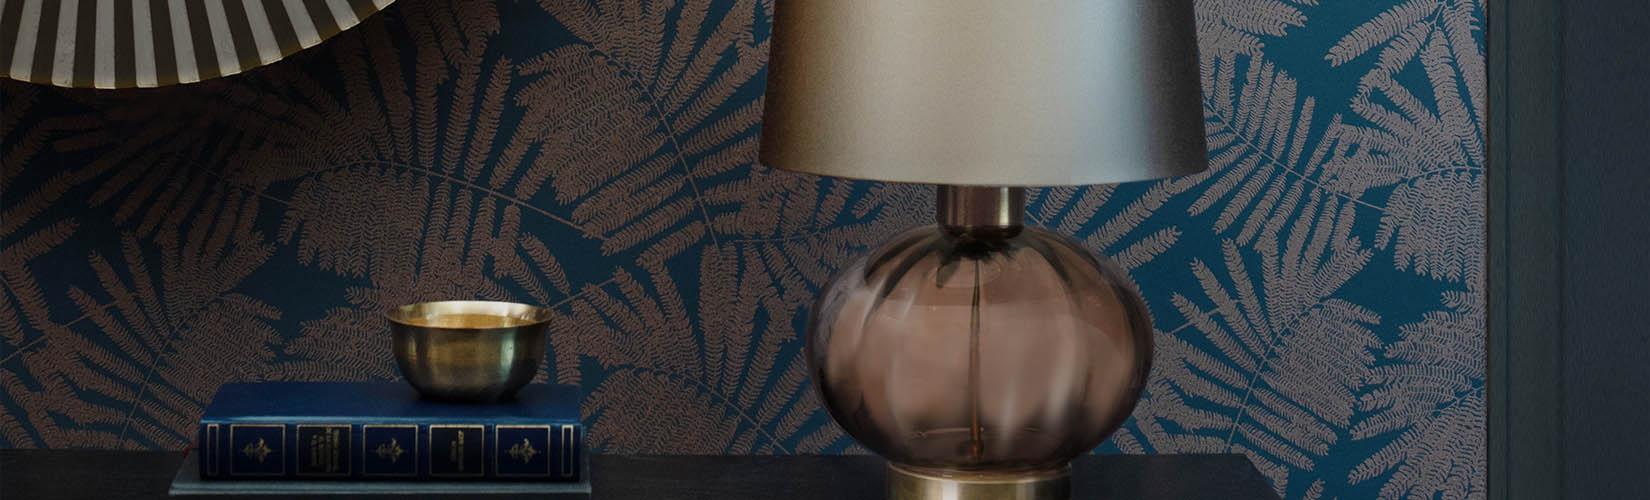 Heathfield & Co. Designer Lighting: Brand Focus